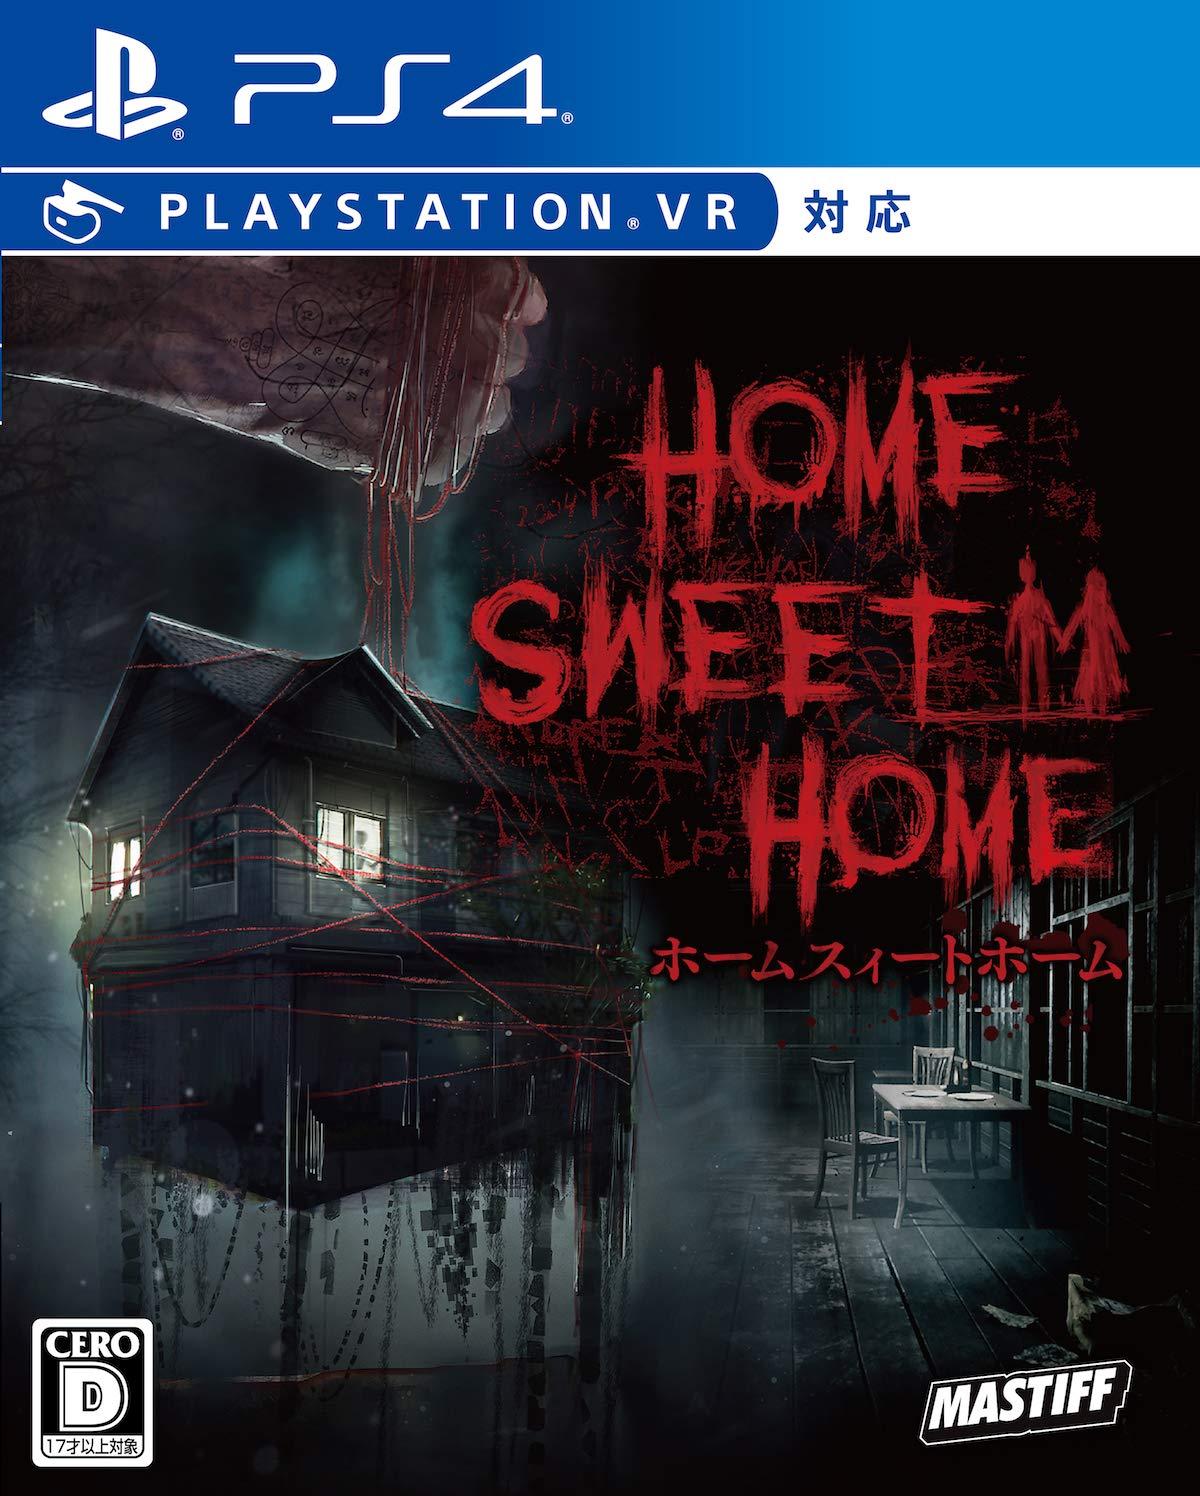 HOME SWEET HOME - PS4 (【永久封入特典】「HOME SWEET HOME」キャラクター・アバター プロダクトコード & 【Amazon.co.jp限定特典】オリジナルPC壁紙 配信 同梱)